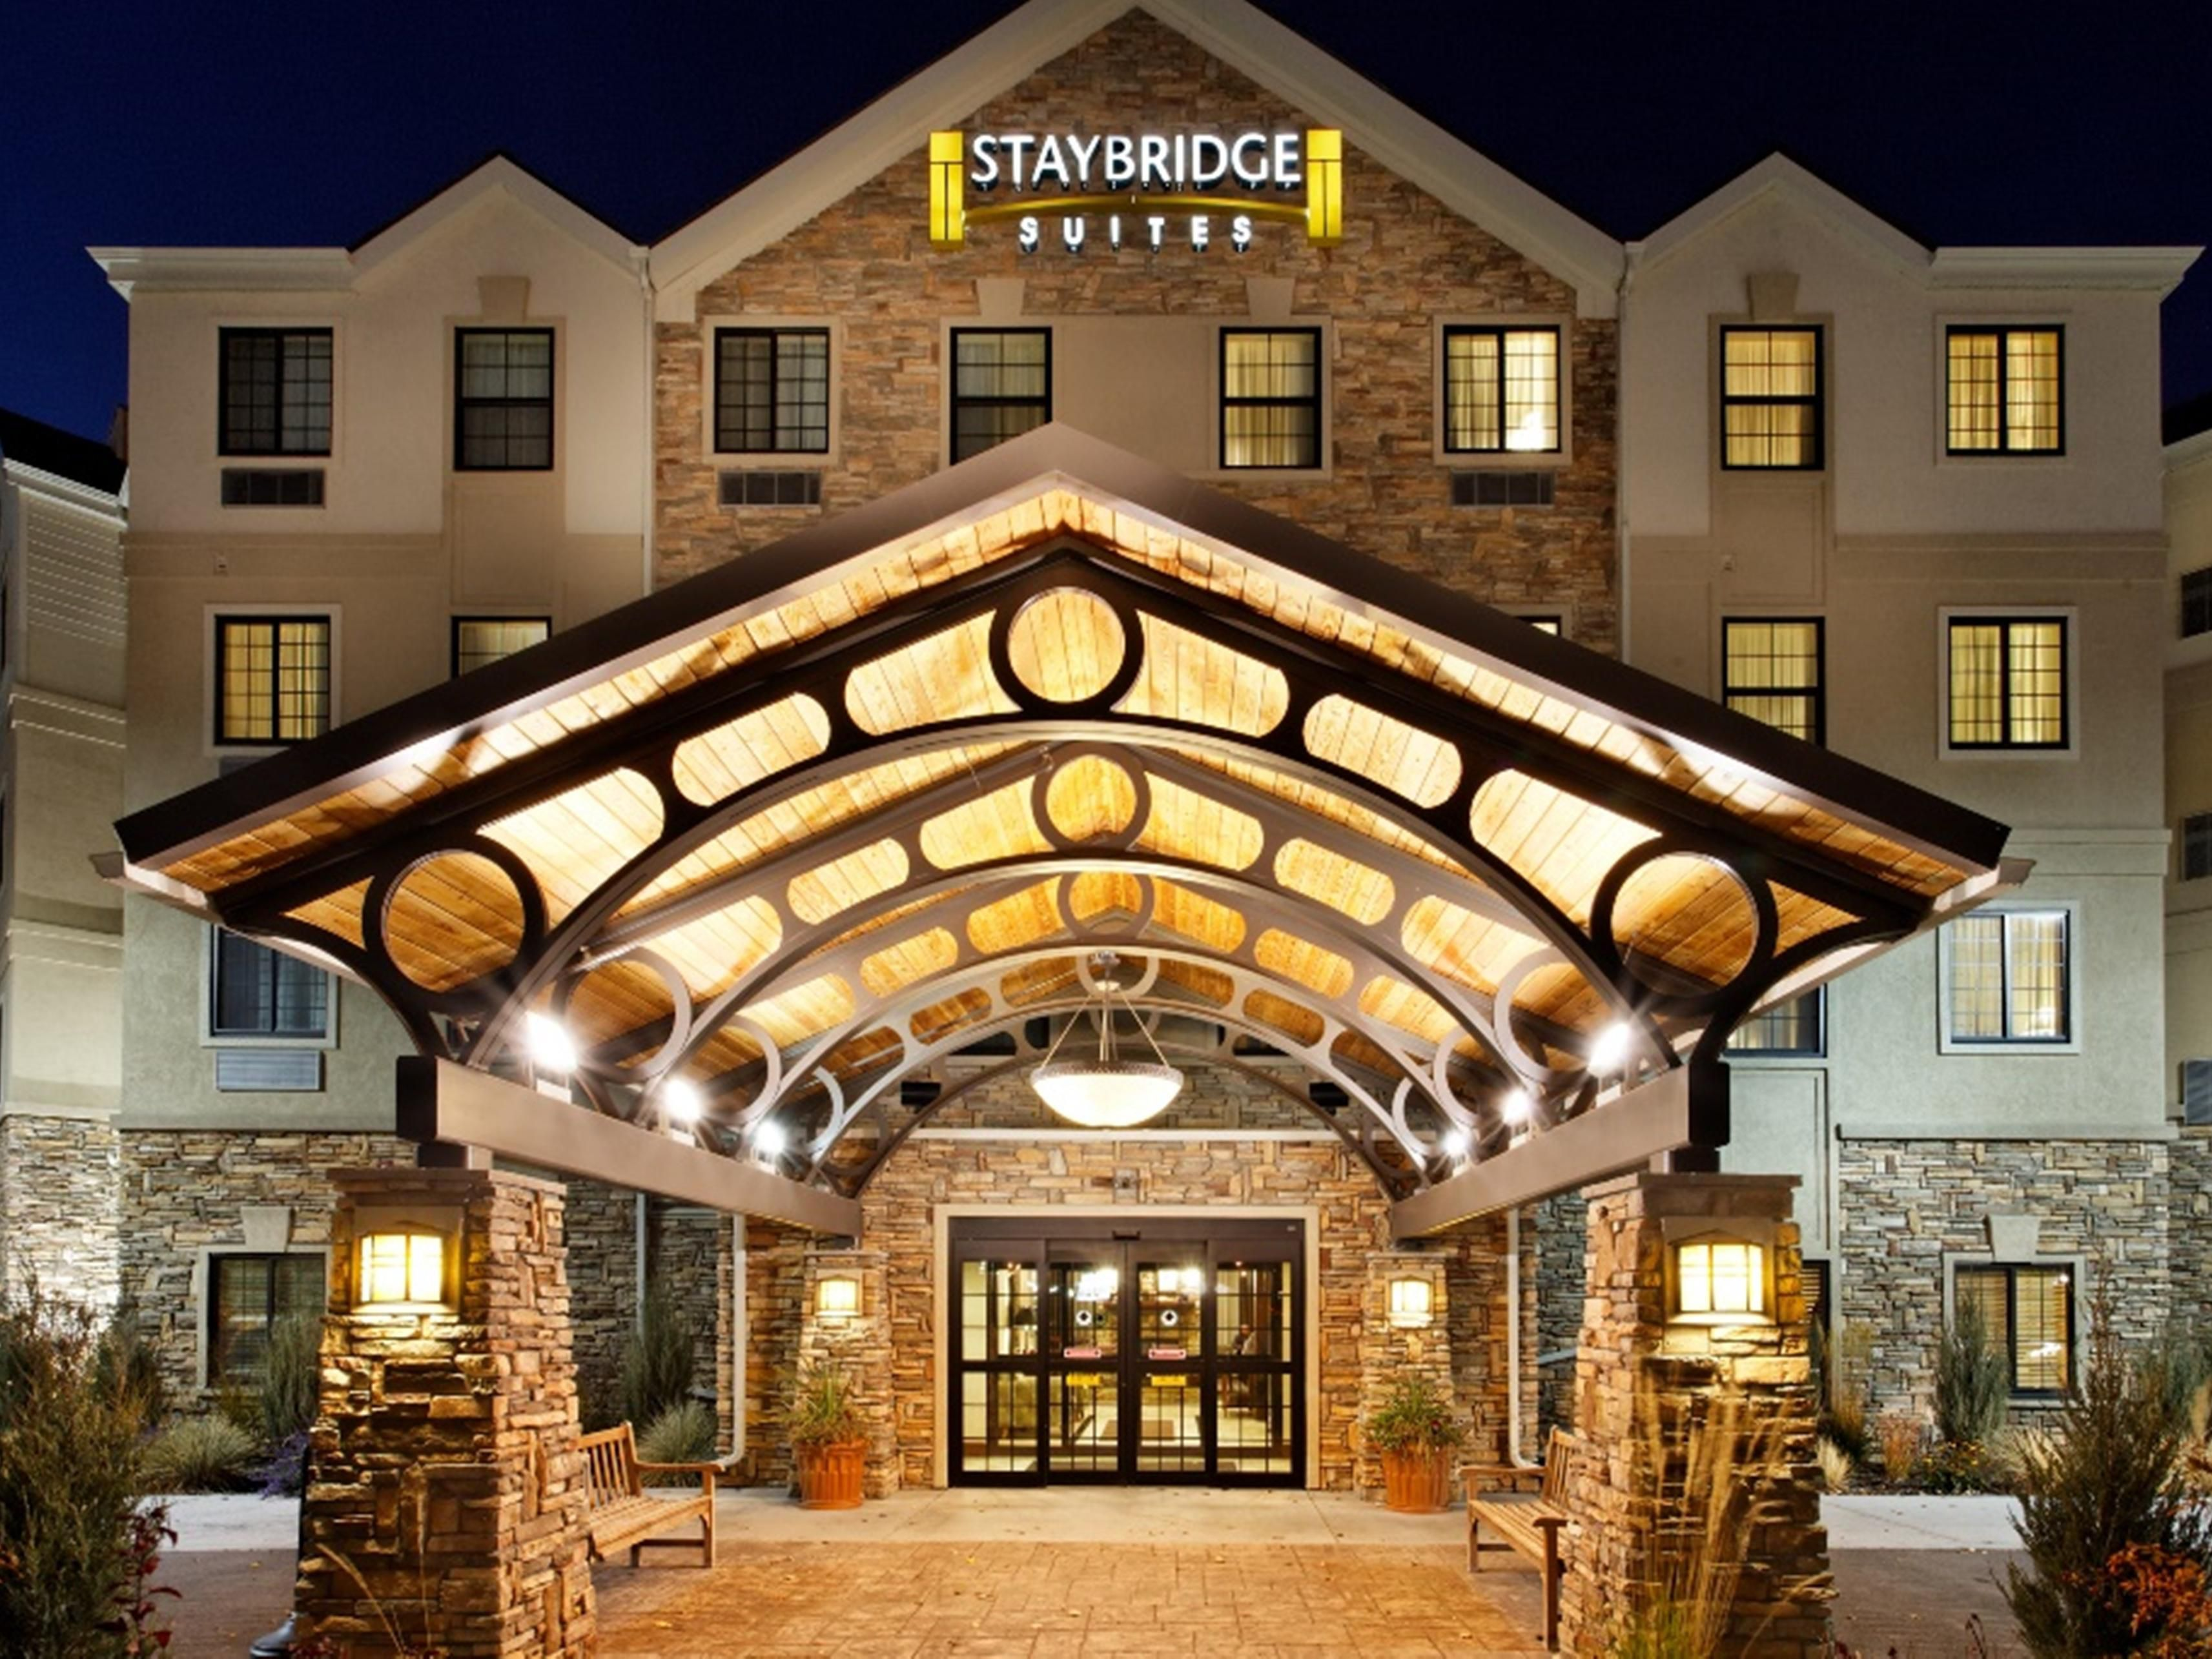 Rossford Hotels Staybridge Suites Toledo Rossford